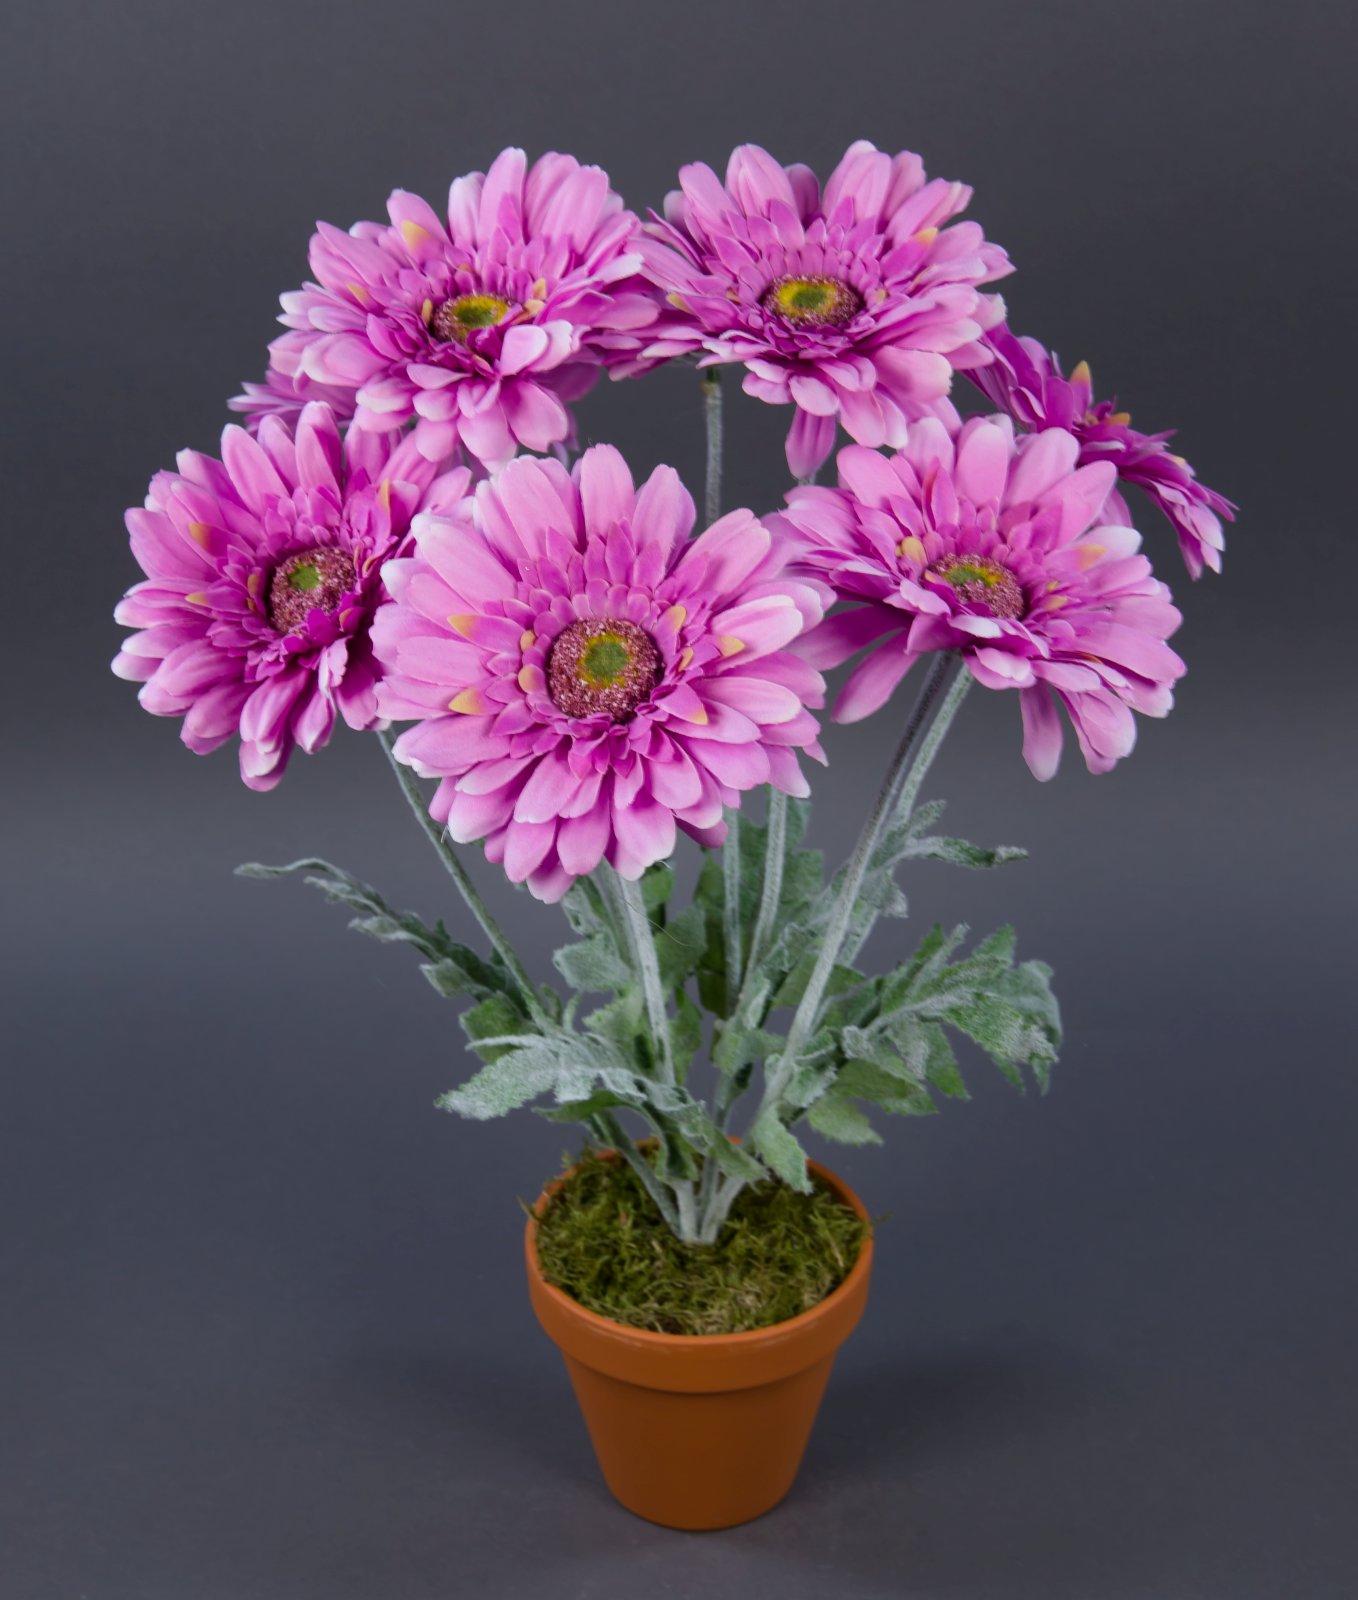 gerbera 45cm lavendel im topf lm kunstpflanzen k nstliche pflanzen kunstblumen ebay. Black Bedroom Furniture Sets. Home Design Ideas